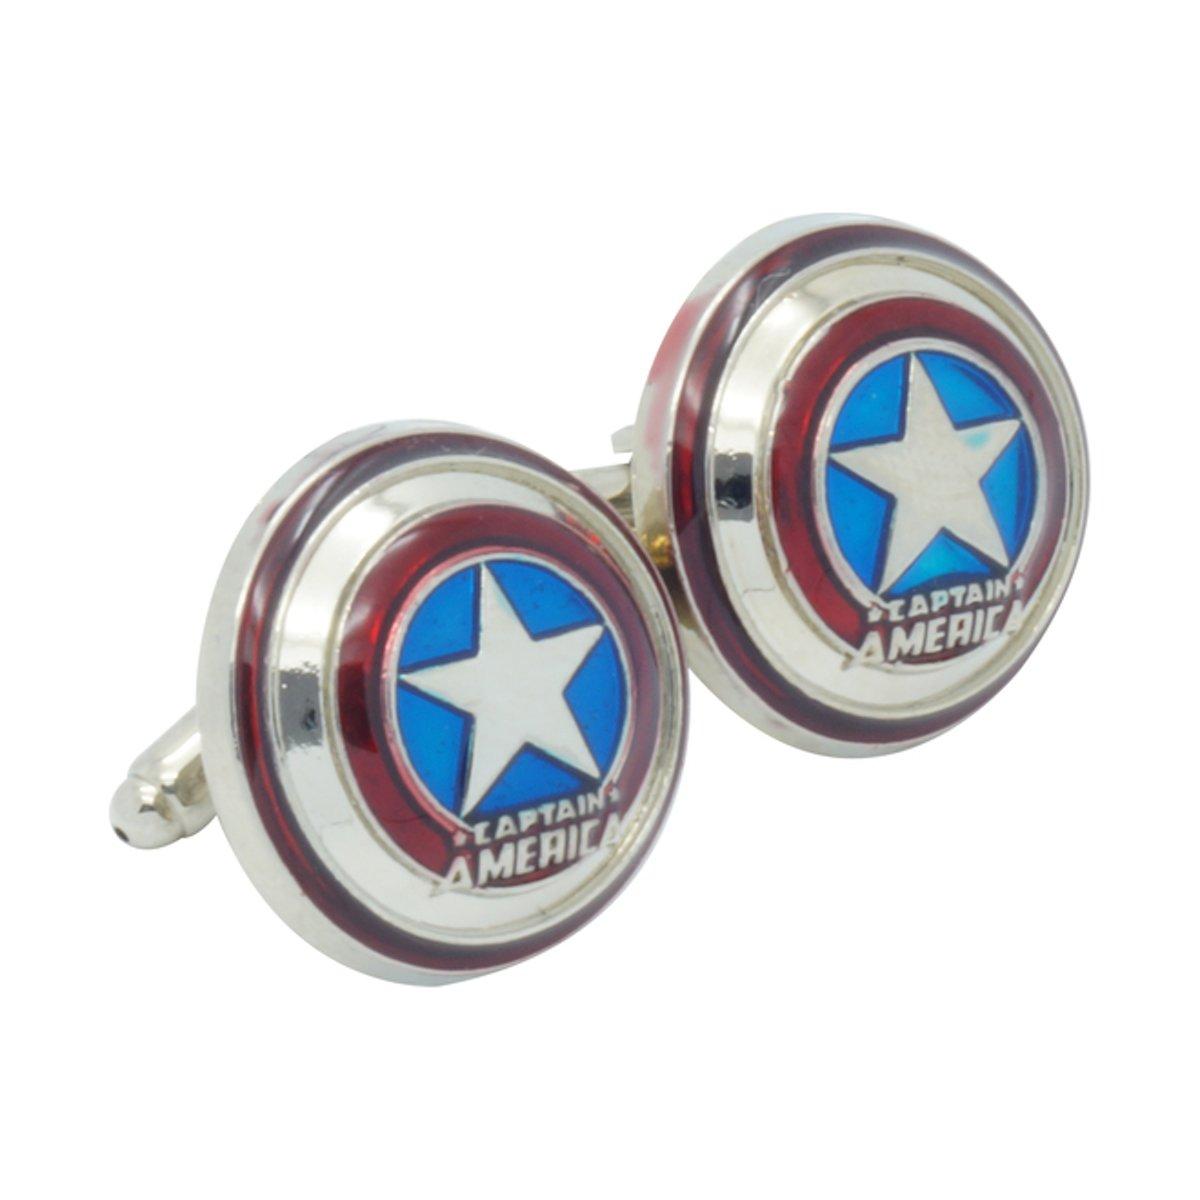 Captain America Manchetknopen kopen